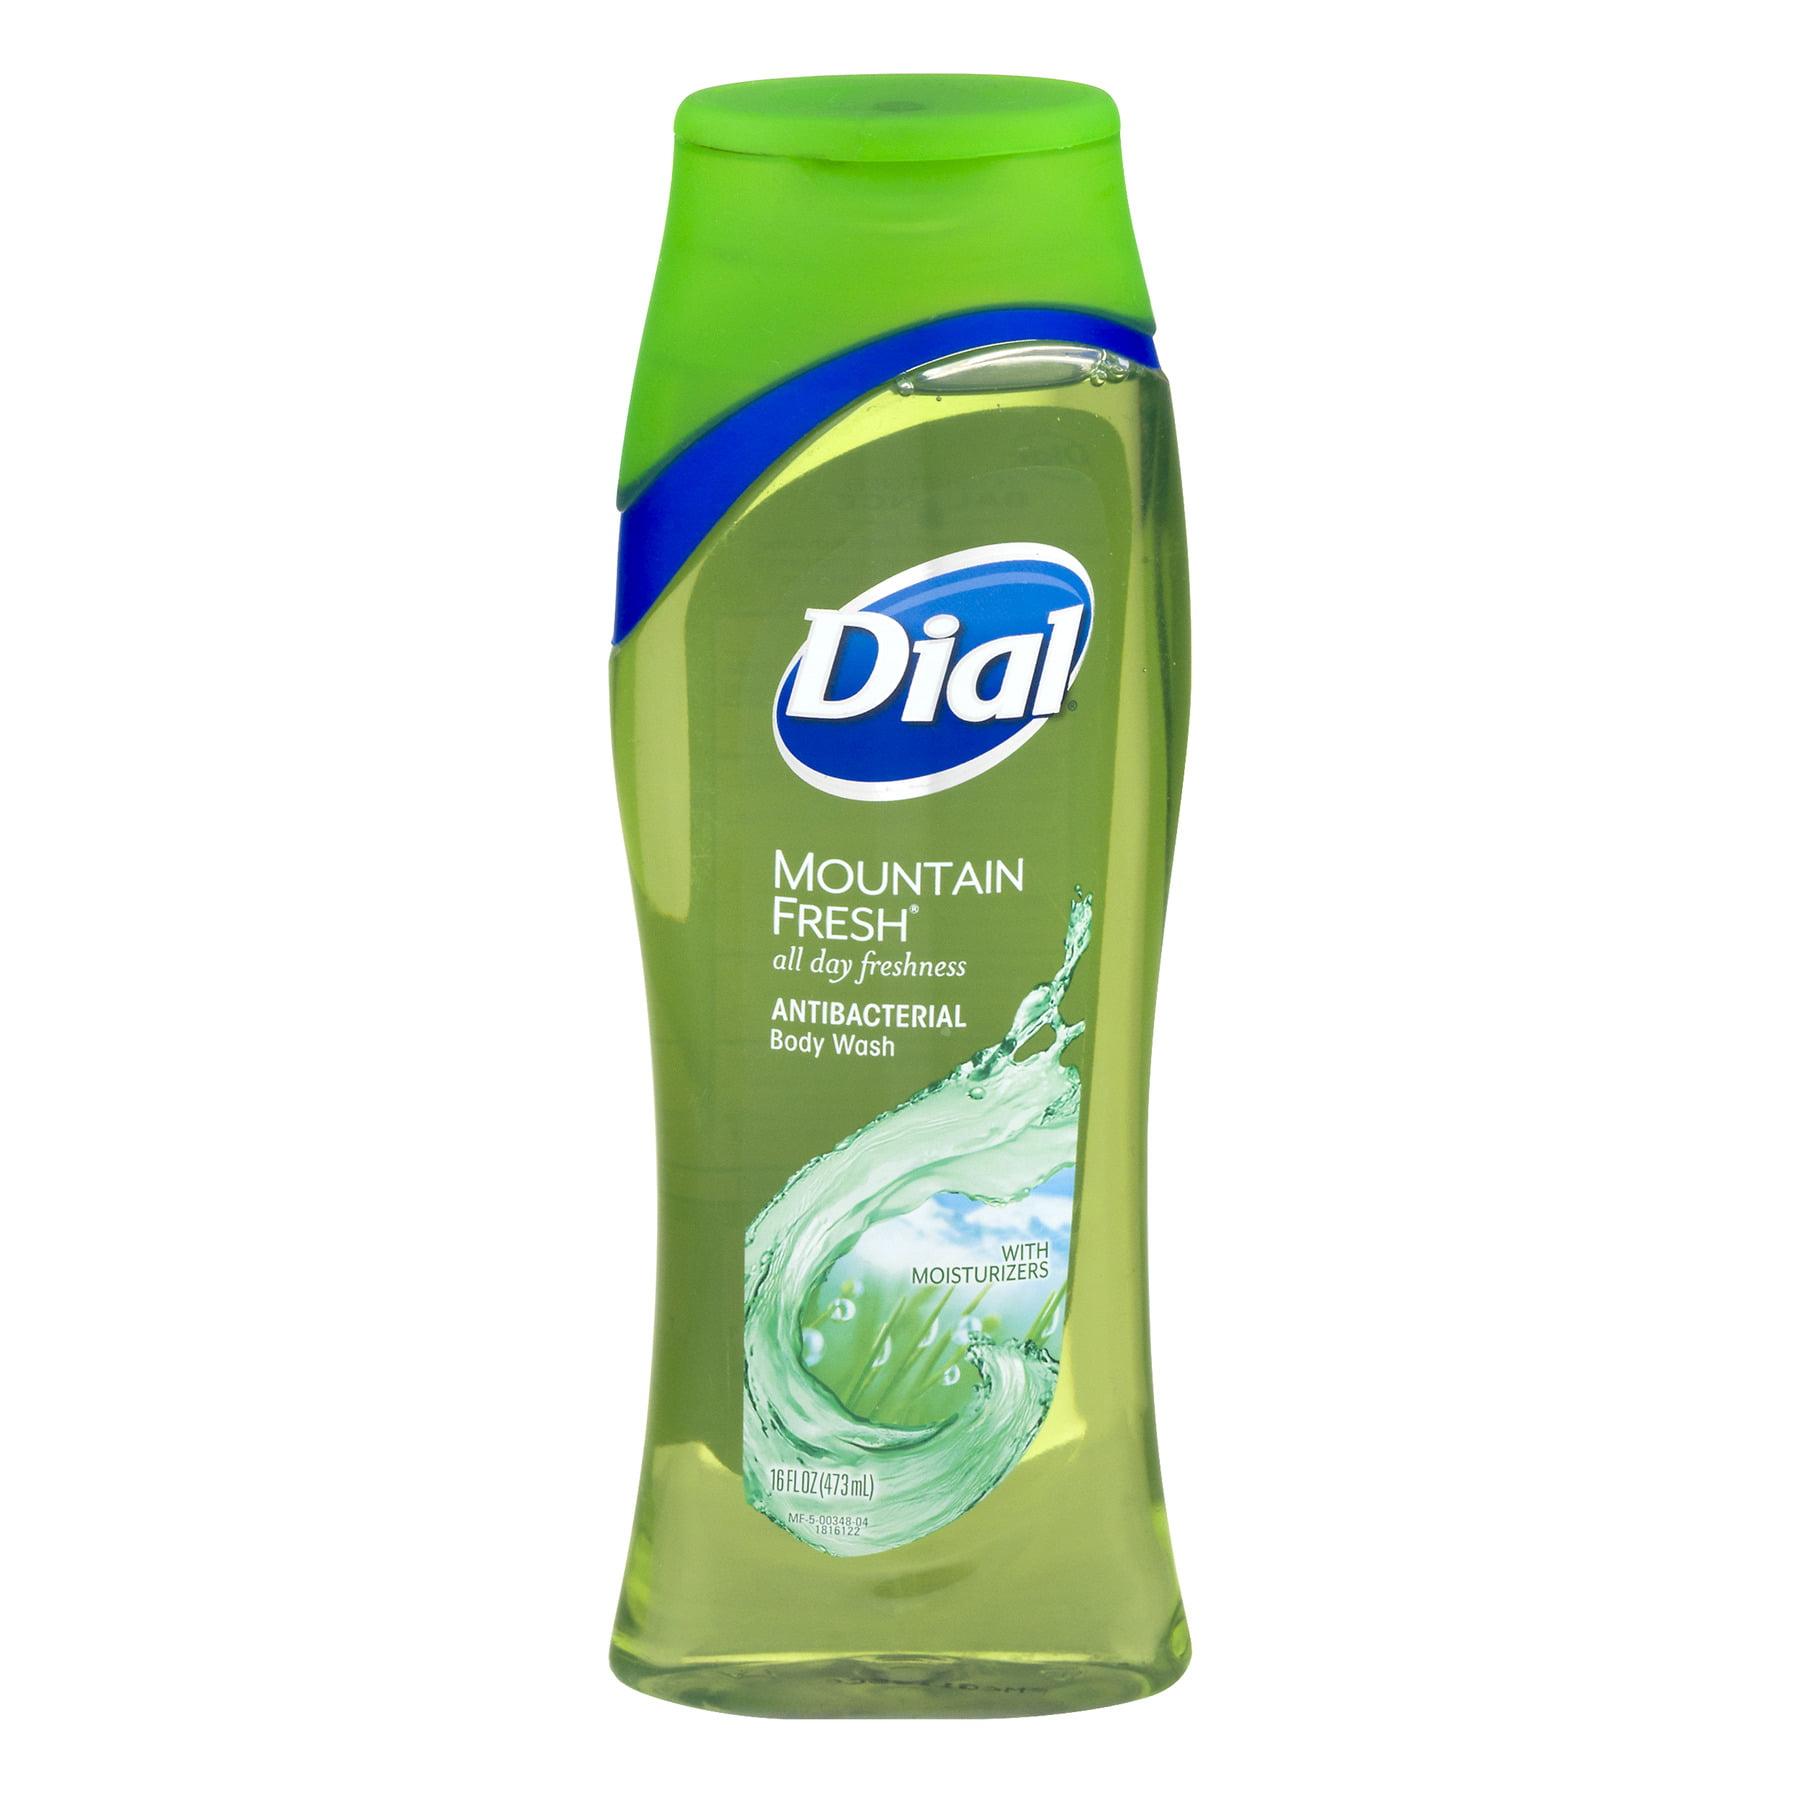 Dial Mountain Fresh Body Wash, 16.0 FL OZ